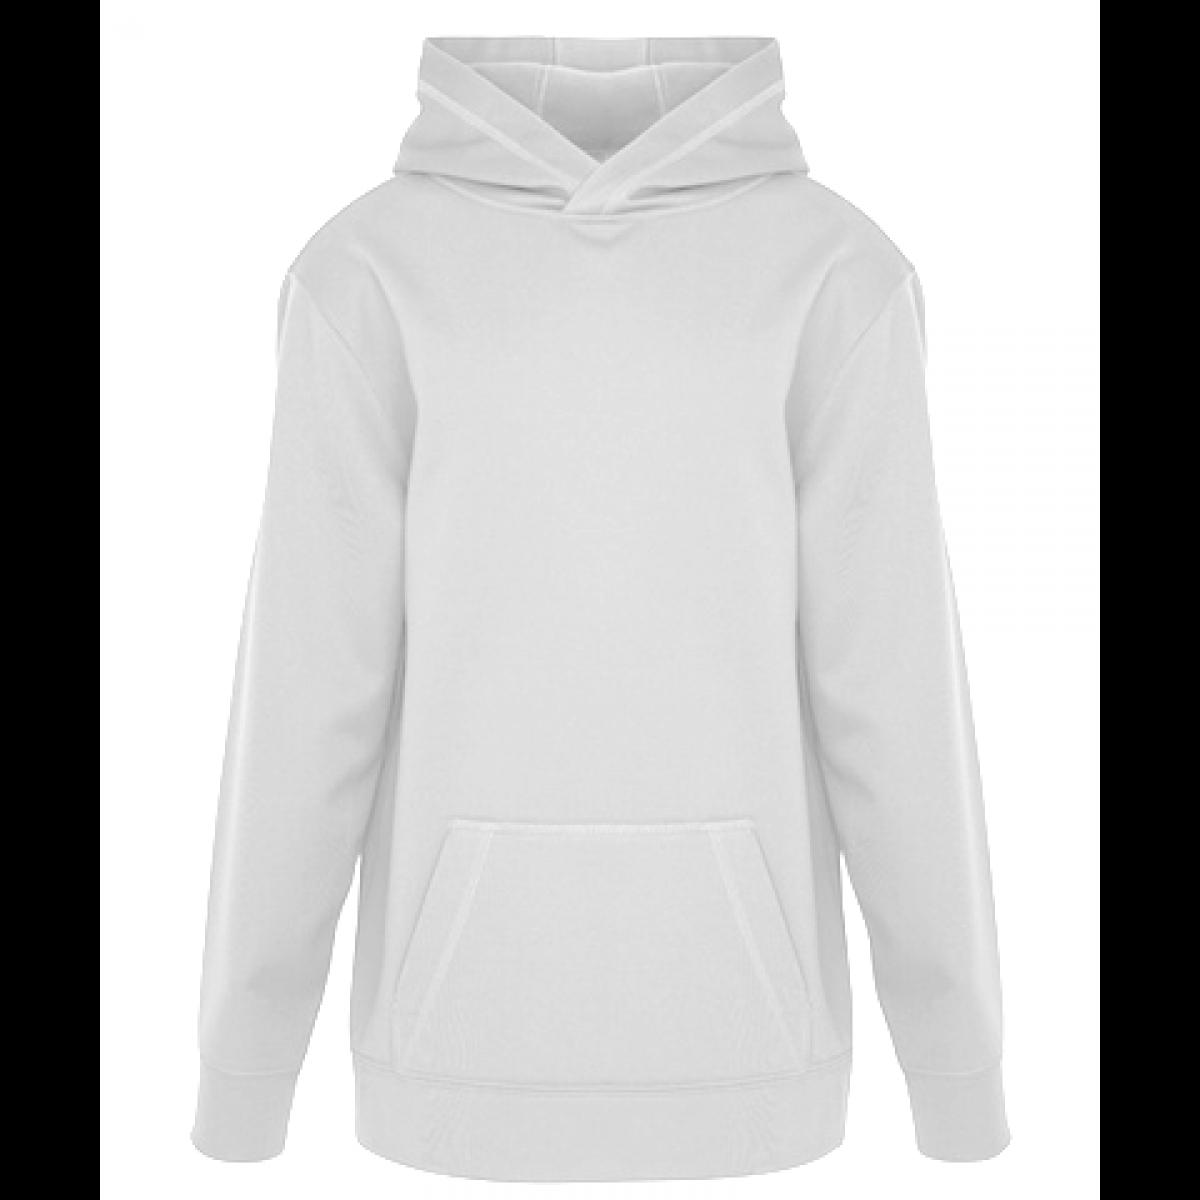 Game Day Fleece Hooded Ladies Sweatshirt-White-XS